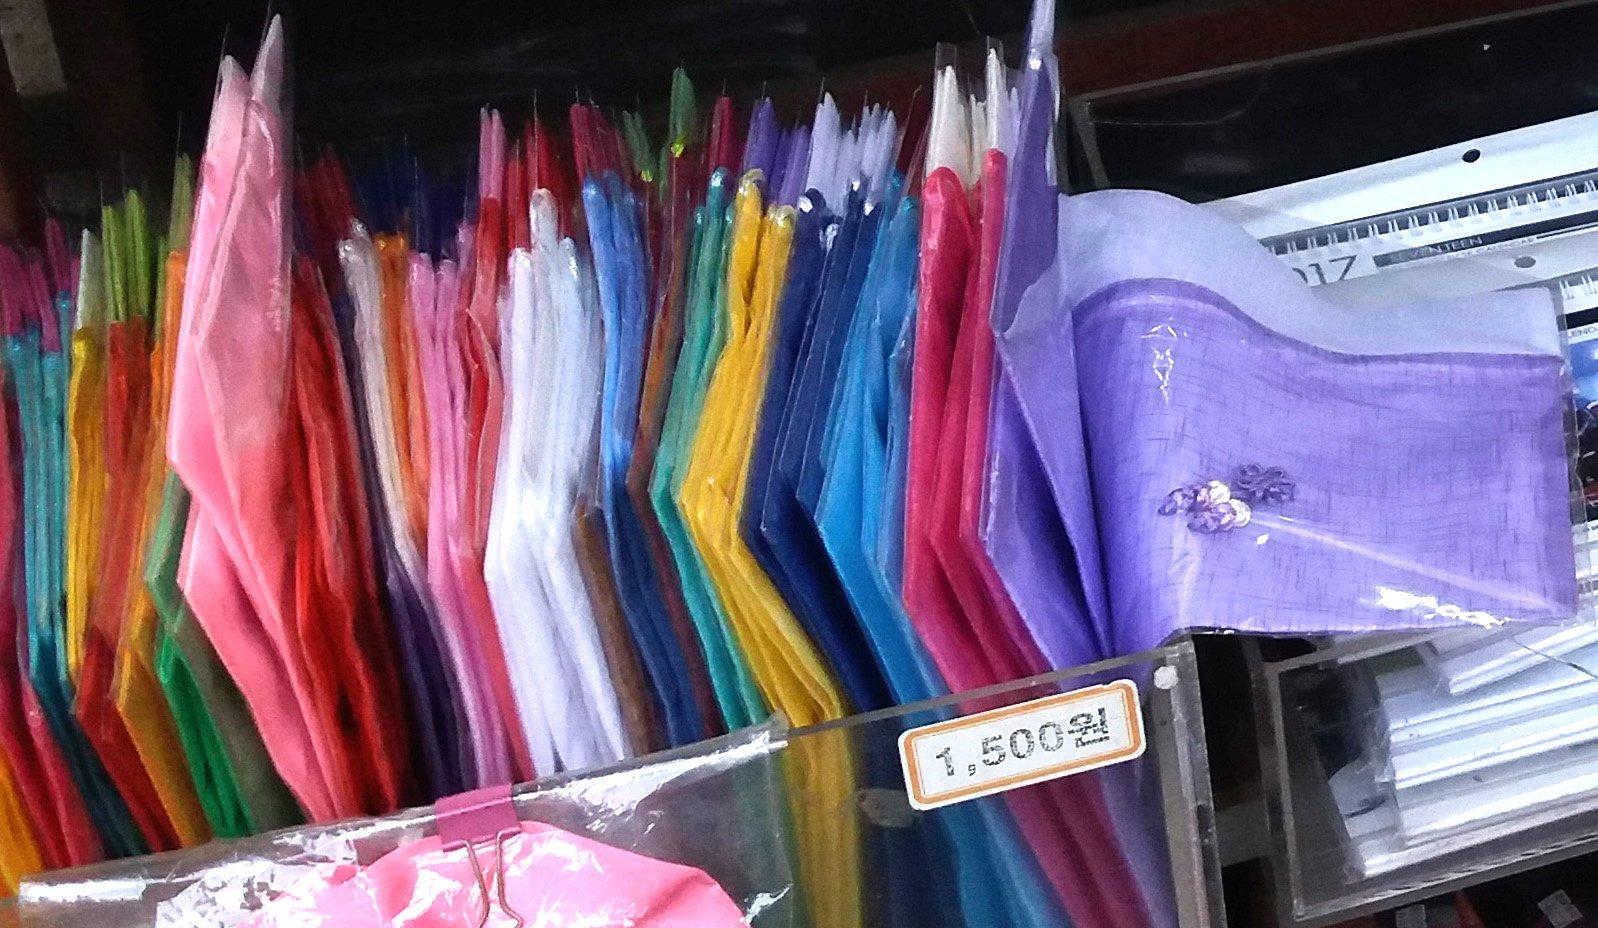 pouches as souvenirs from Korea